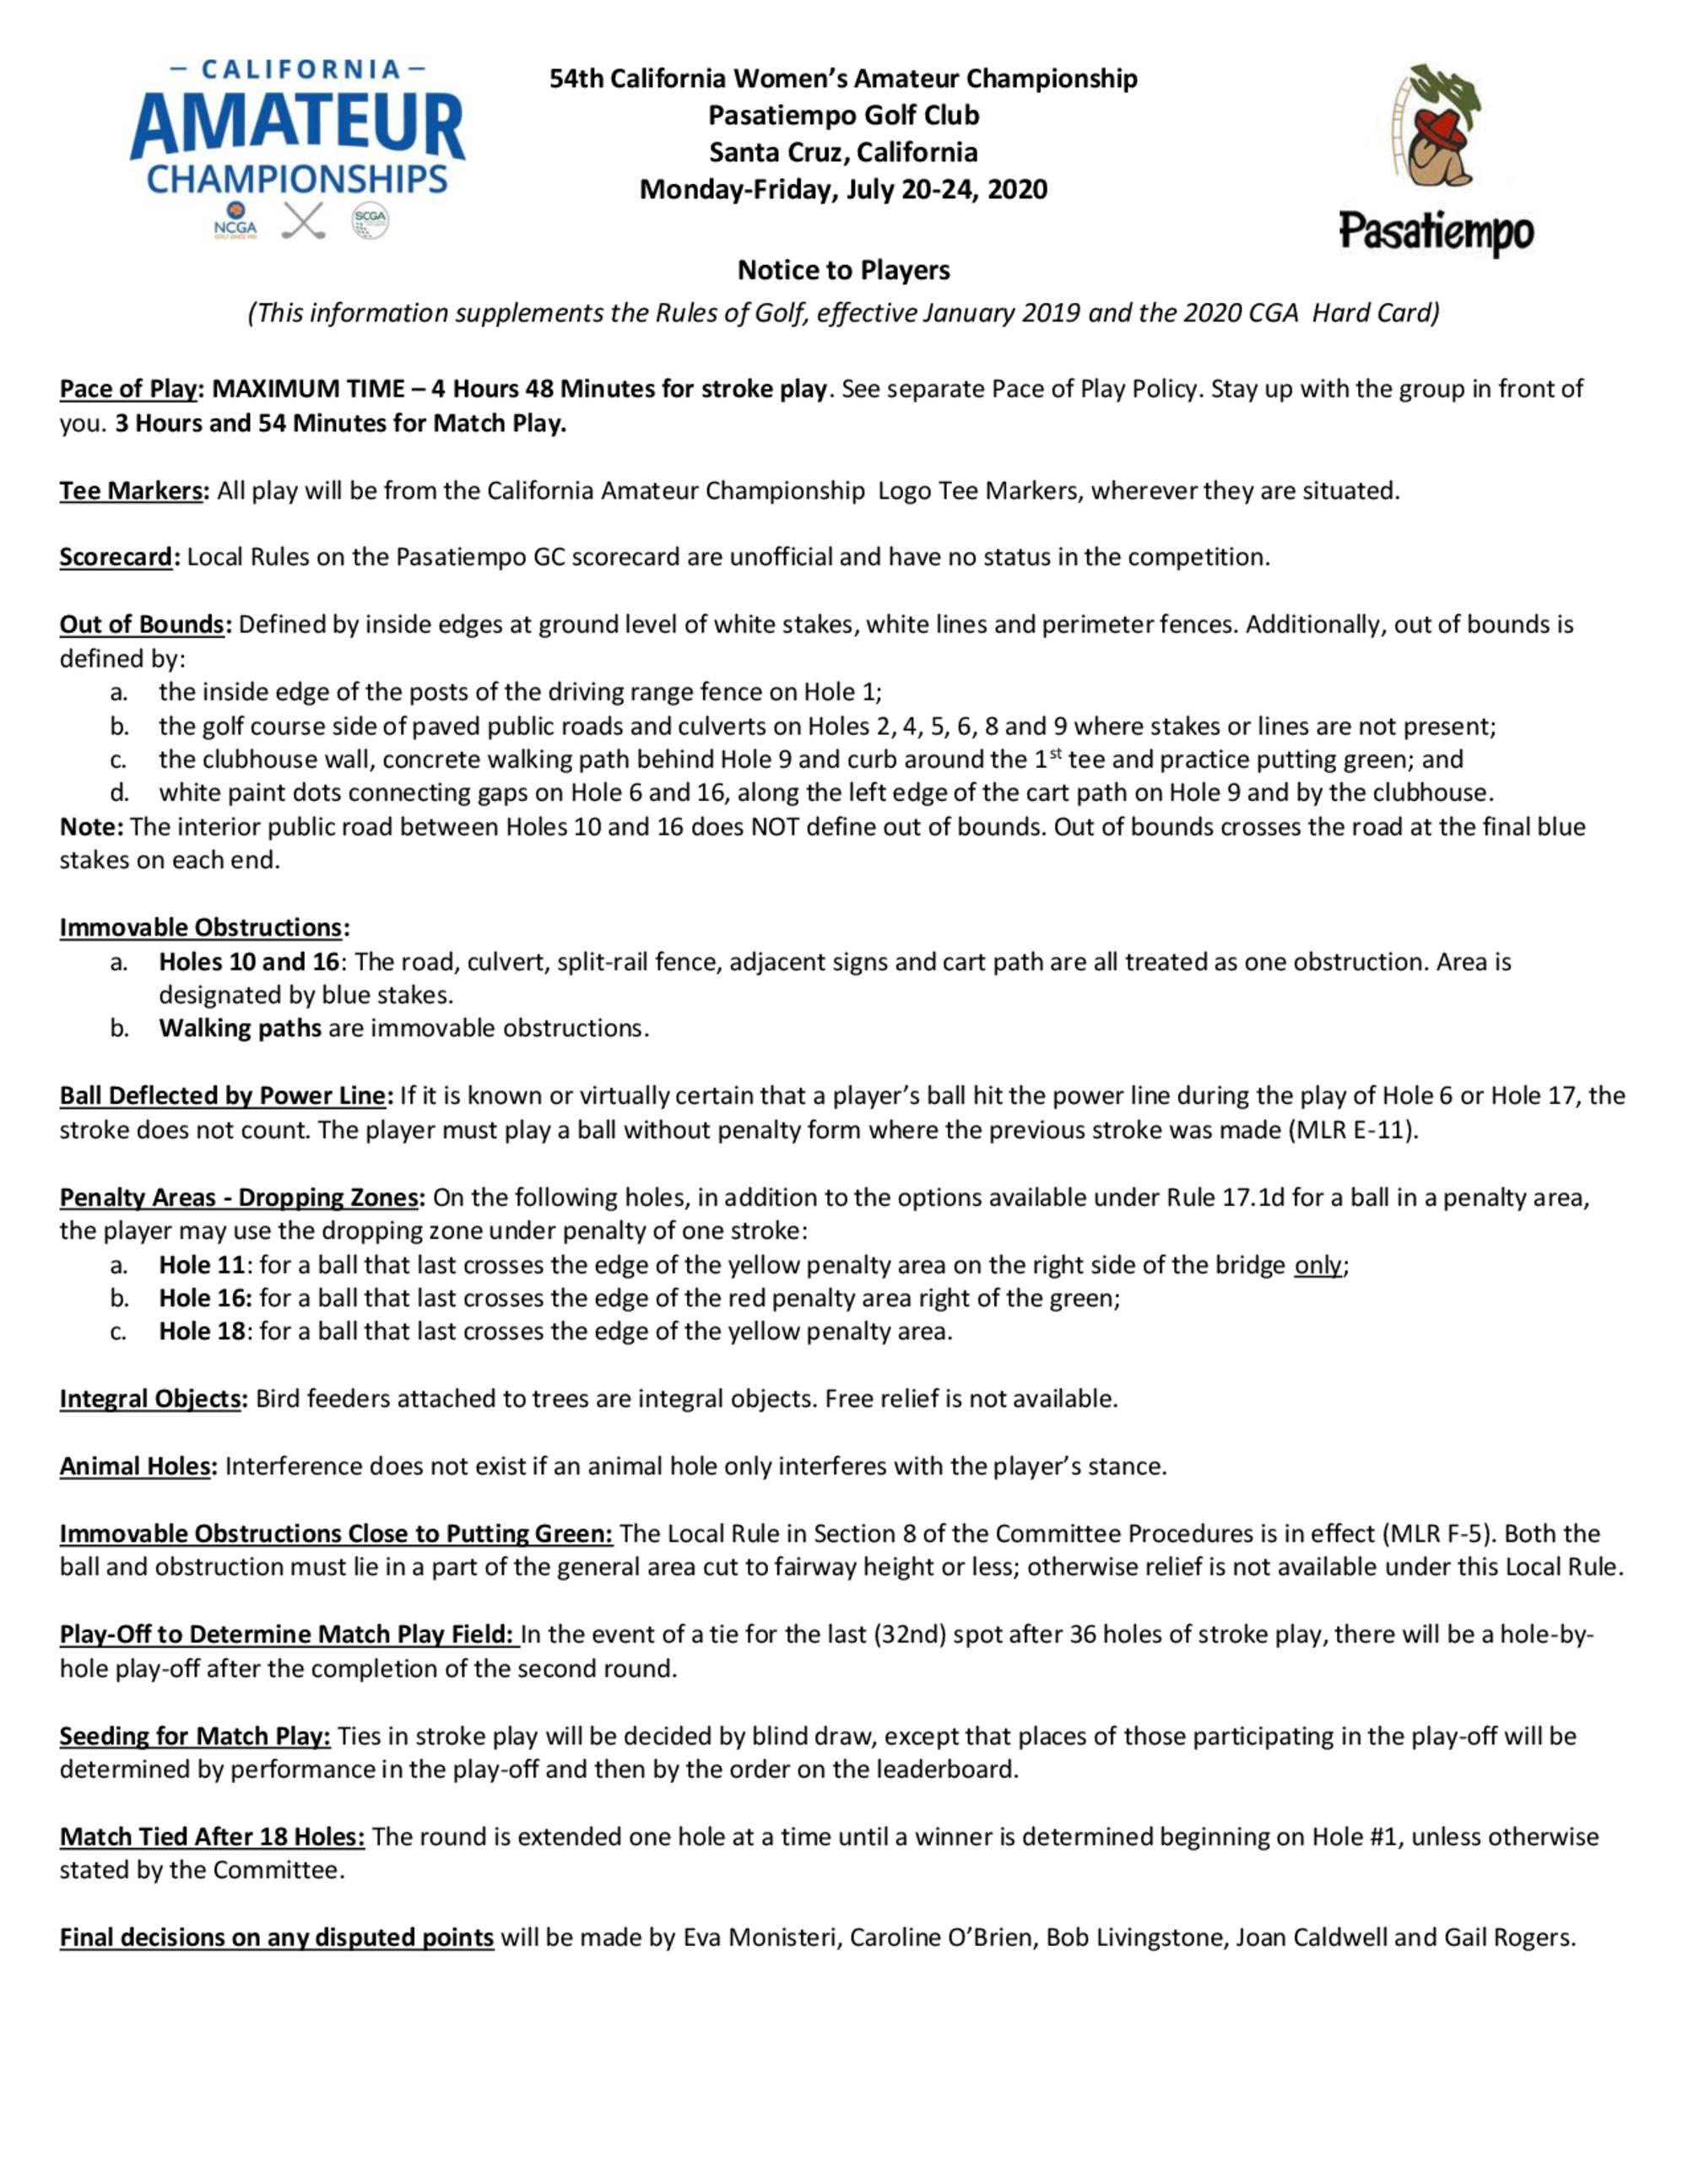 Notice to competitors 1